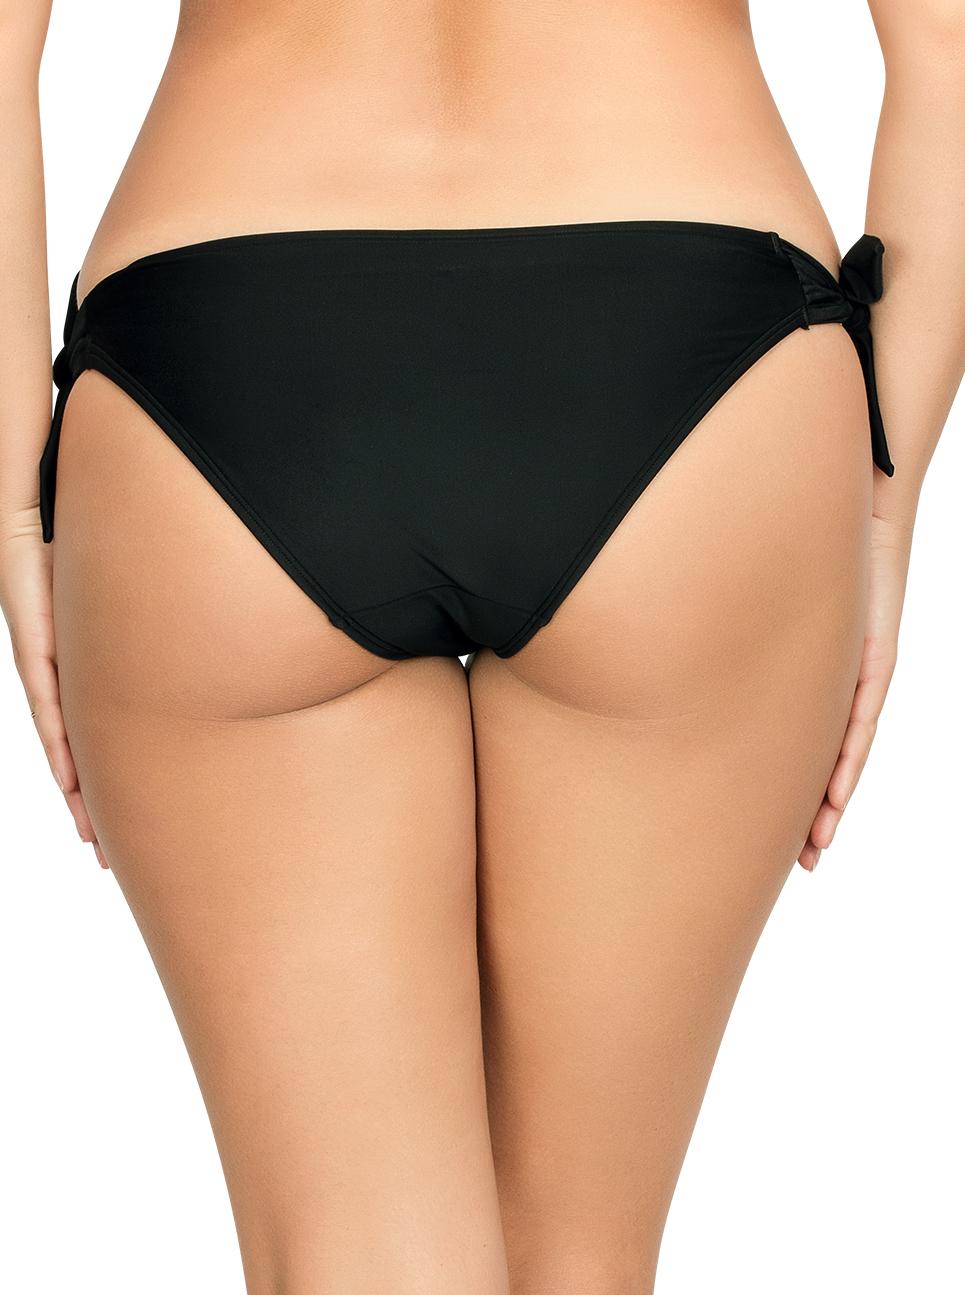 PARFAIT Oceane BikiniBottom Black Back - Oceane Bikini Bottom Black S8063